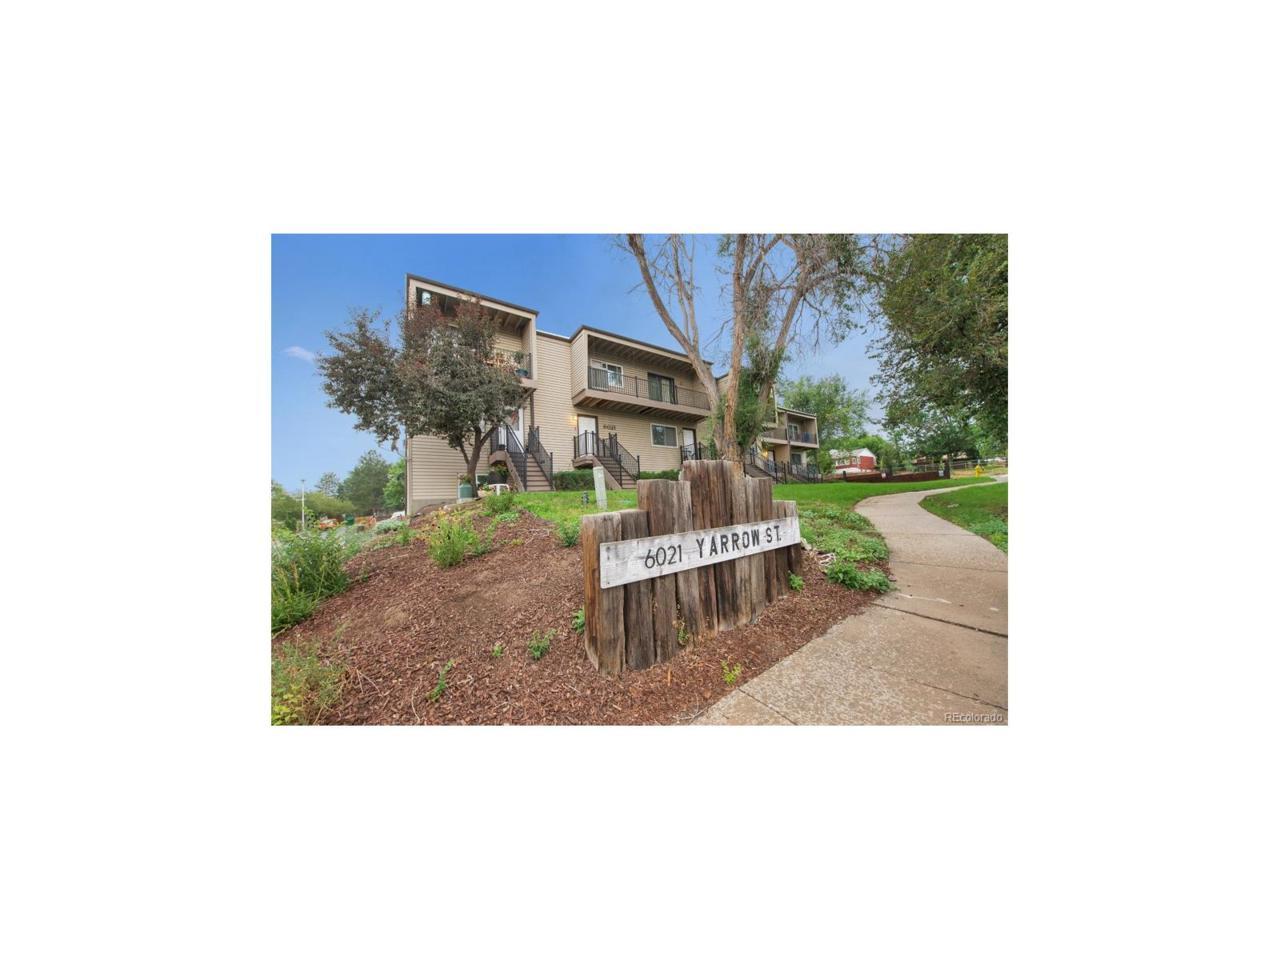 6021 Yarrow Street B16, Arvada, CO 80004 (MLS #2730331) :: 8z Real Estate